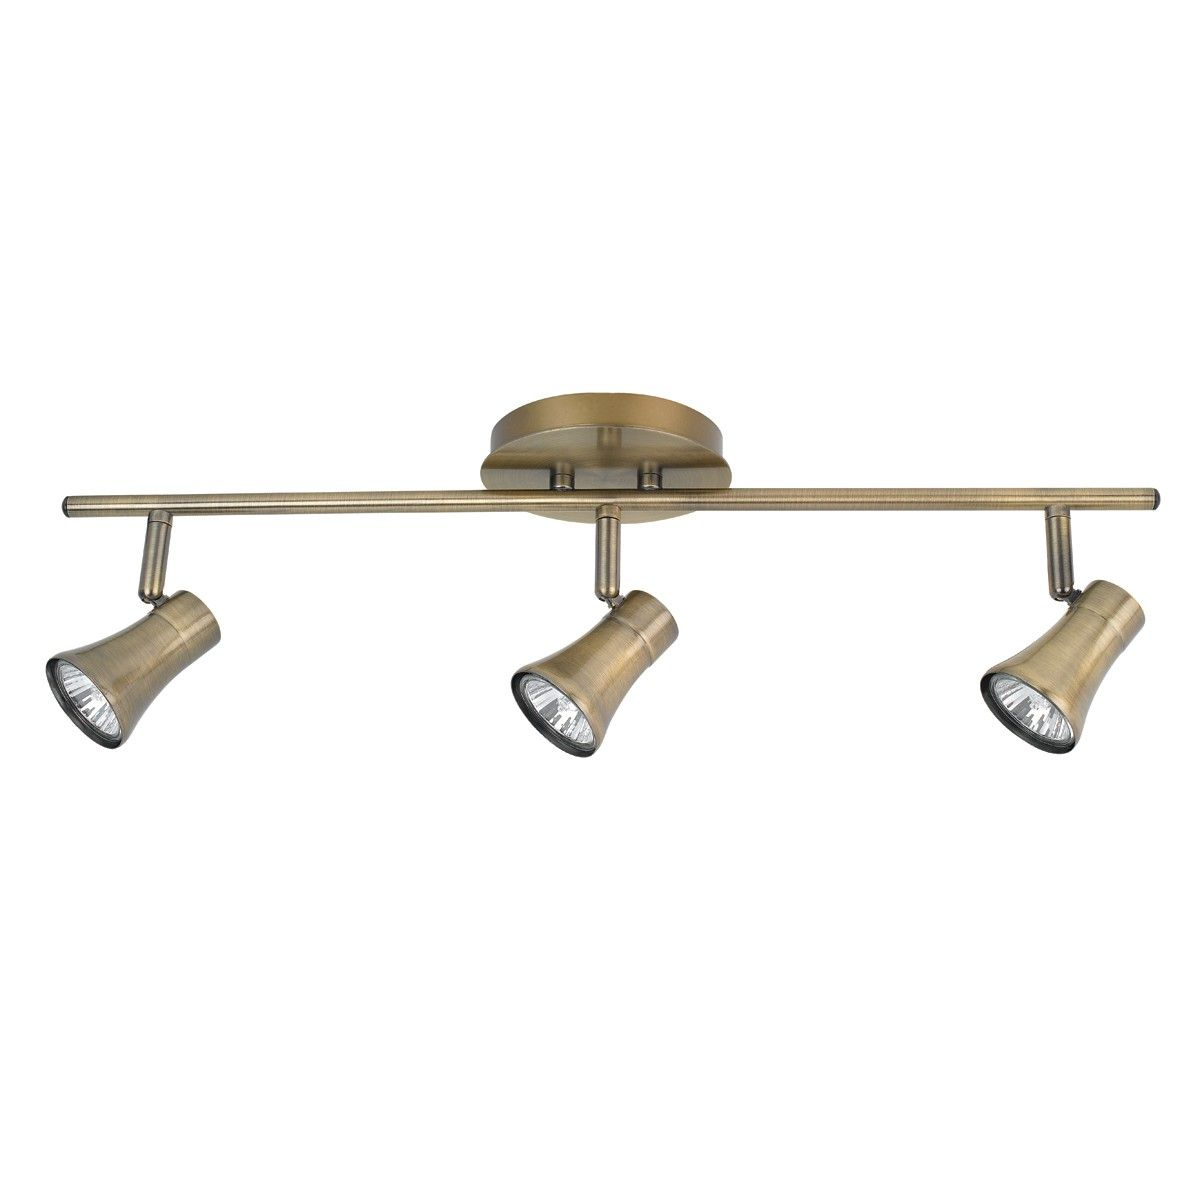 3 Light Track Lighting Kit Antique Brass Finish 4498